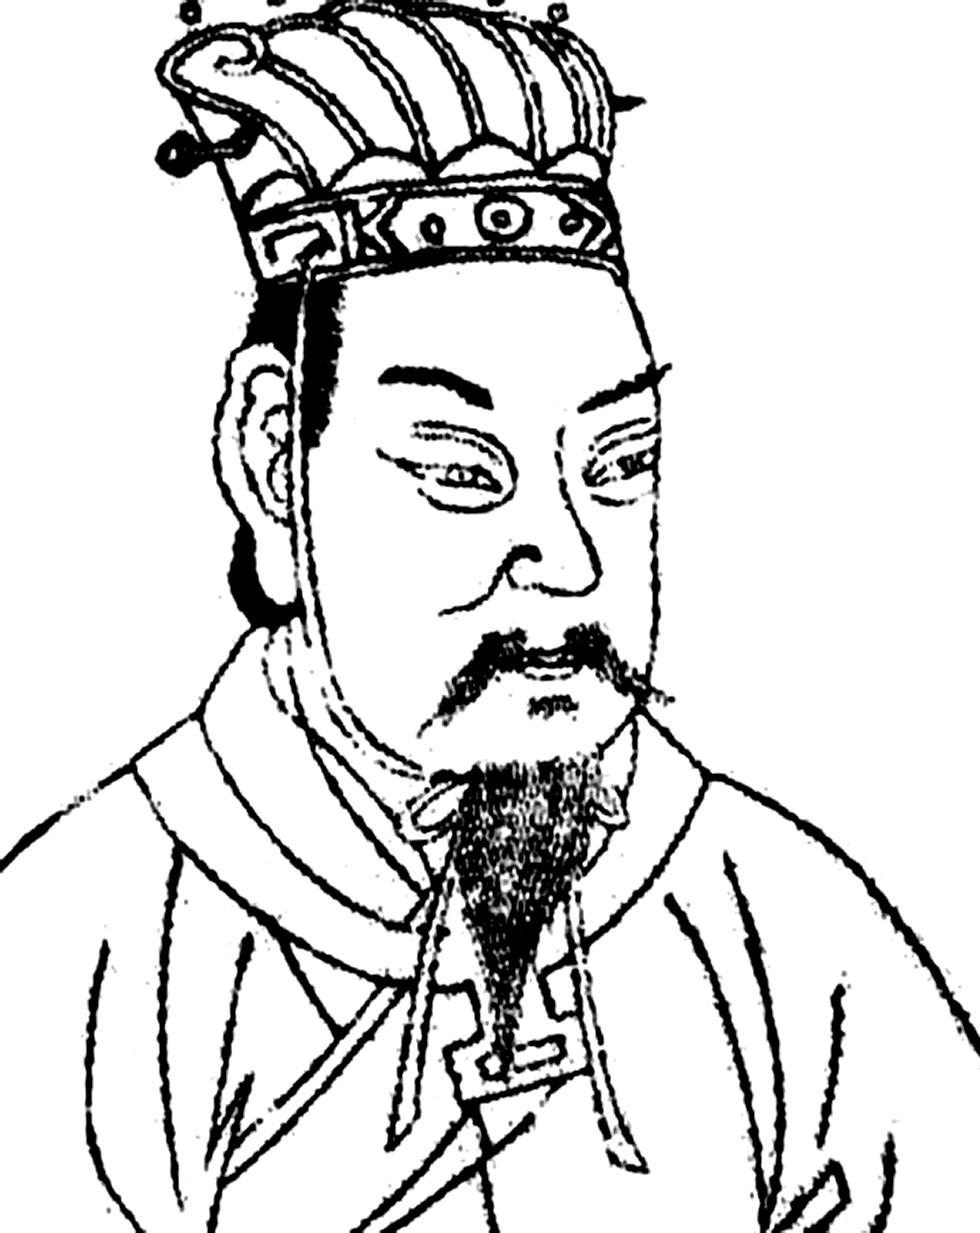 https://upload.wikimedia.org/wikipedia/commons/5/57/Cao_Cao_scth.jpg